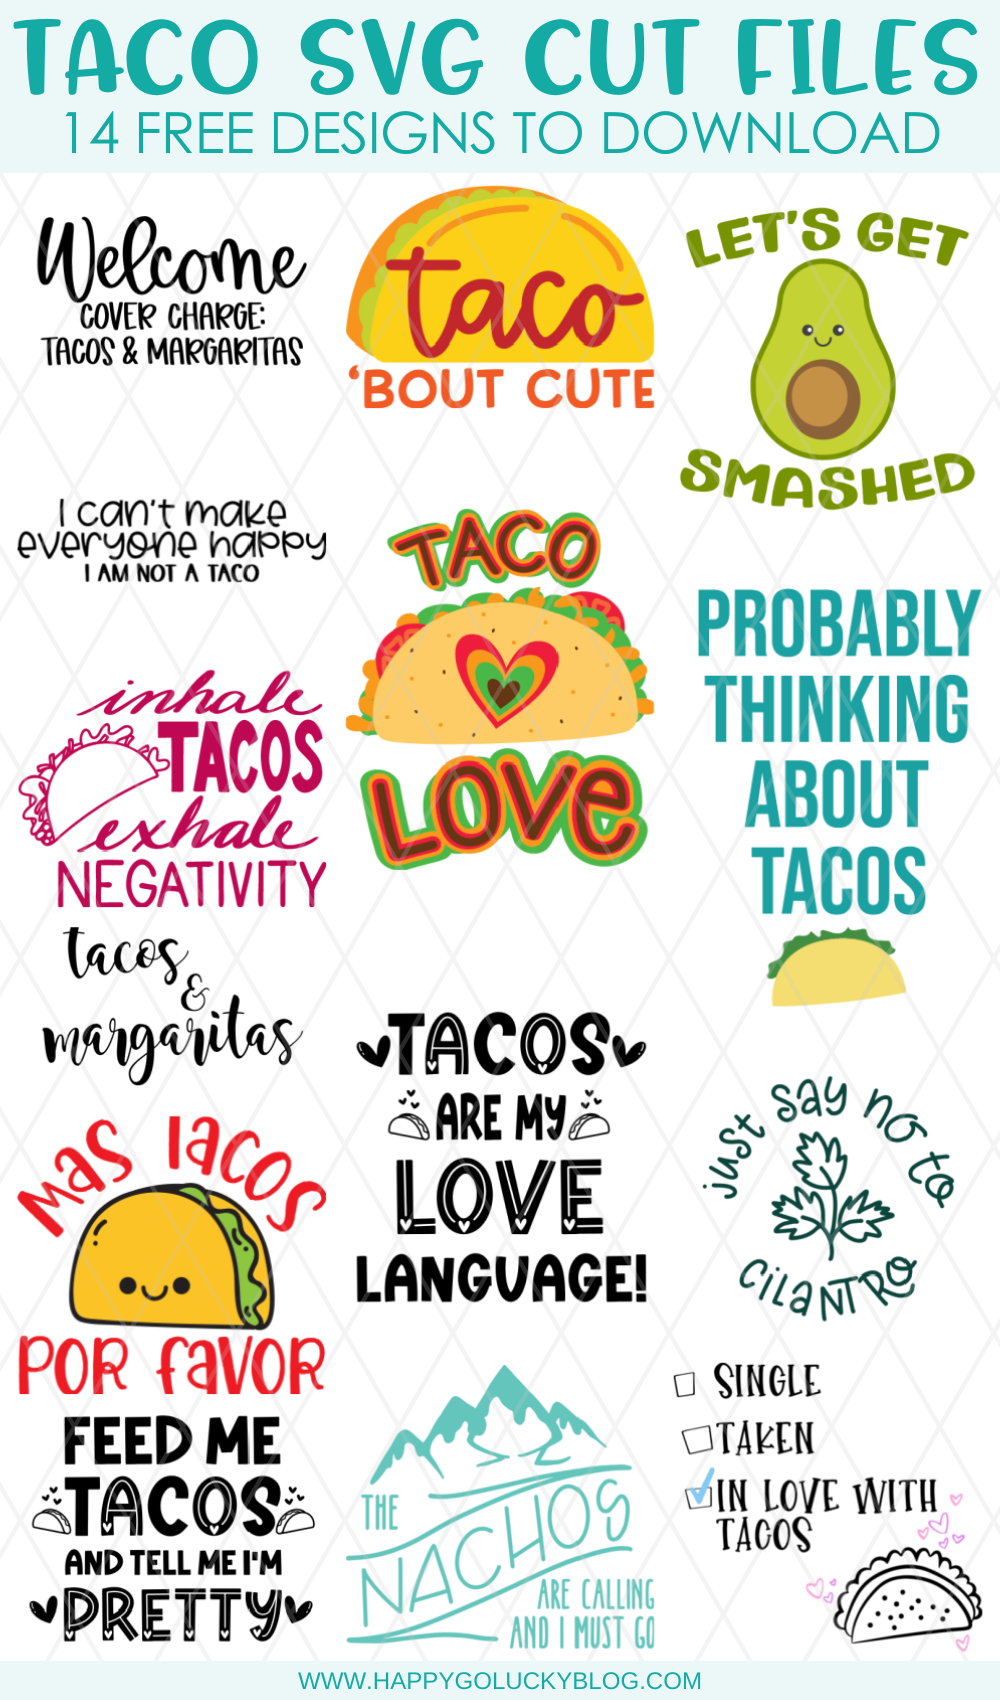 14 Free Taco SVG Cut Files